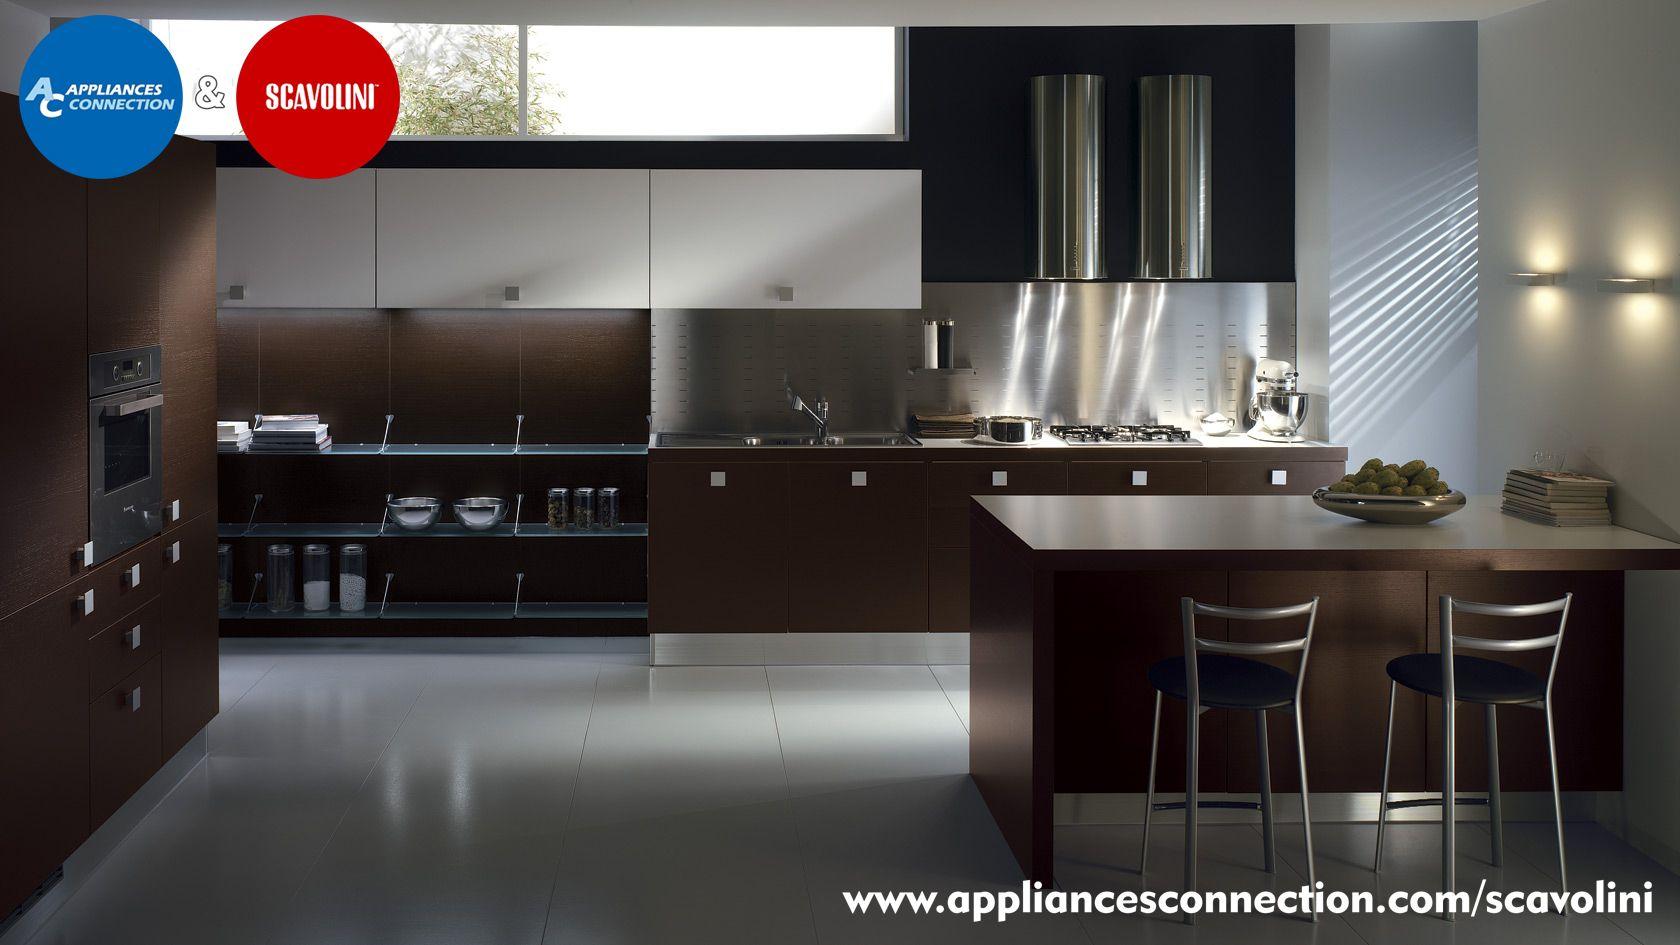 Italian Made and Designed, Scavolini Cabinets come in all styles ...